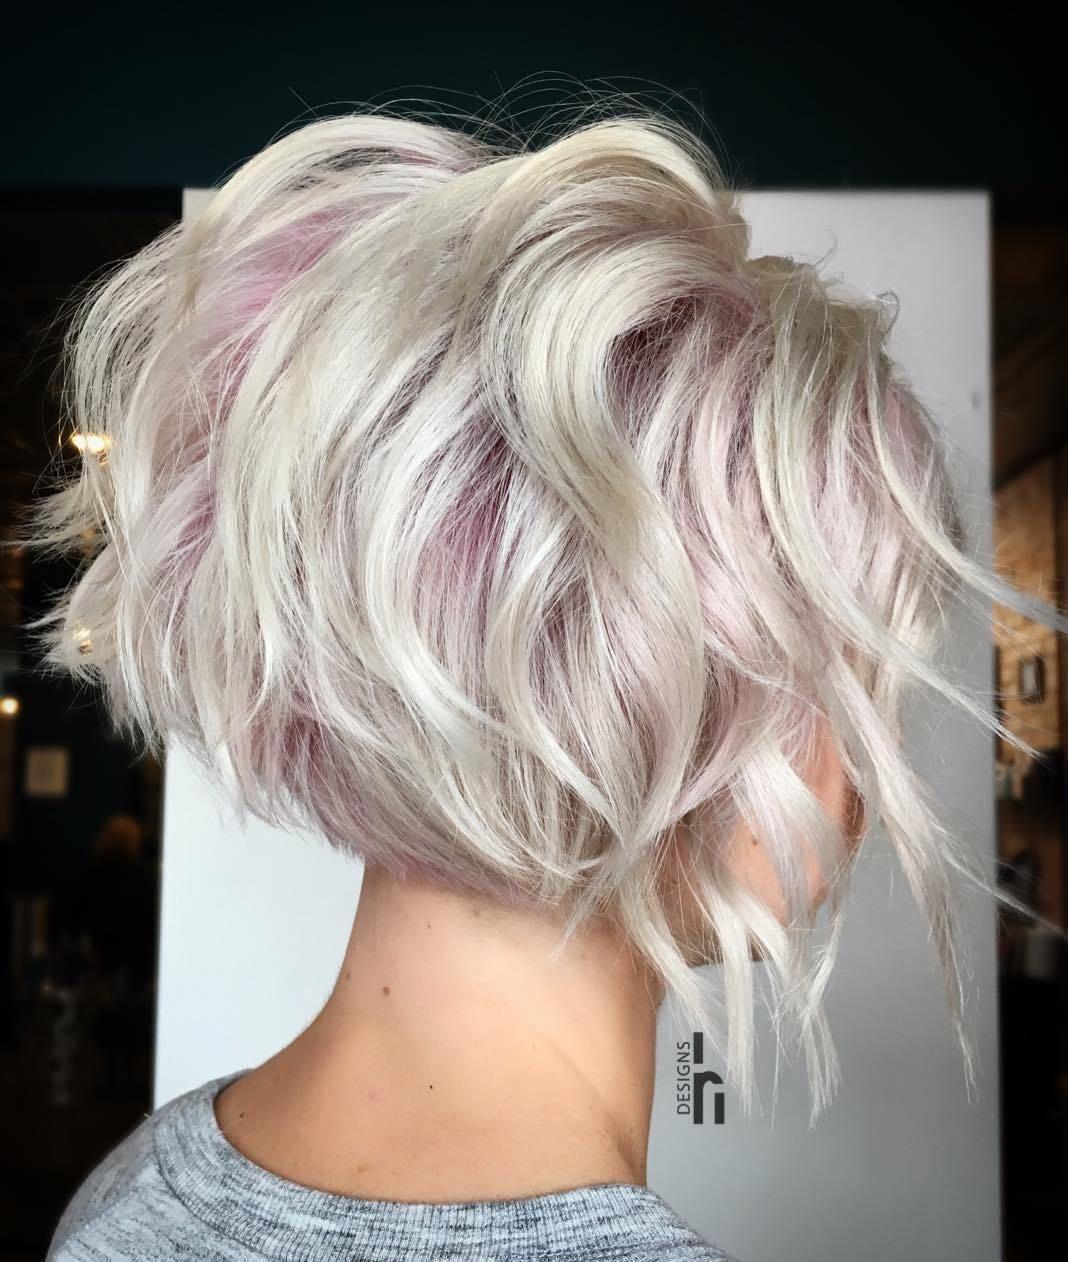 70 overwhelming ideas for short choppy haircuts | hott